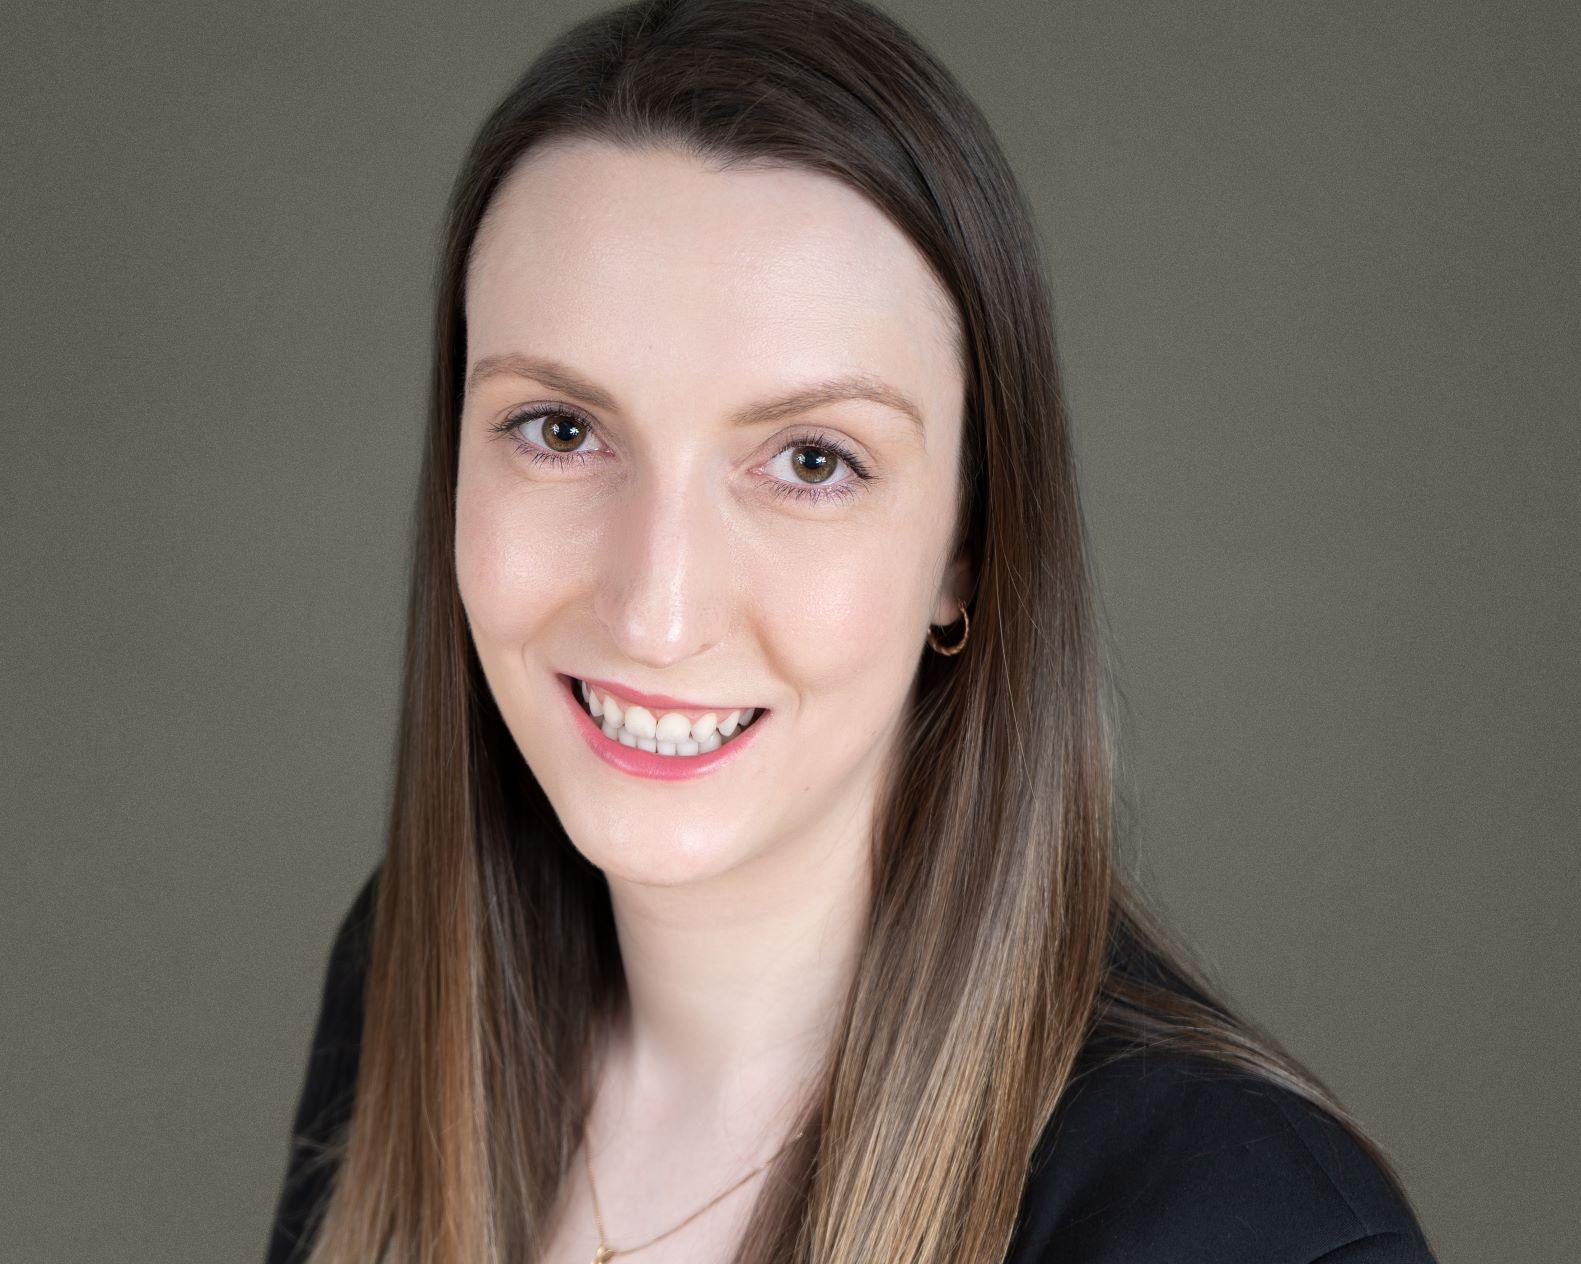 Professional portrait of Jaclyn Hutchinson